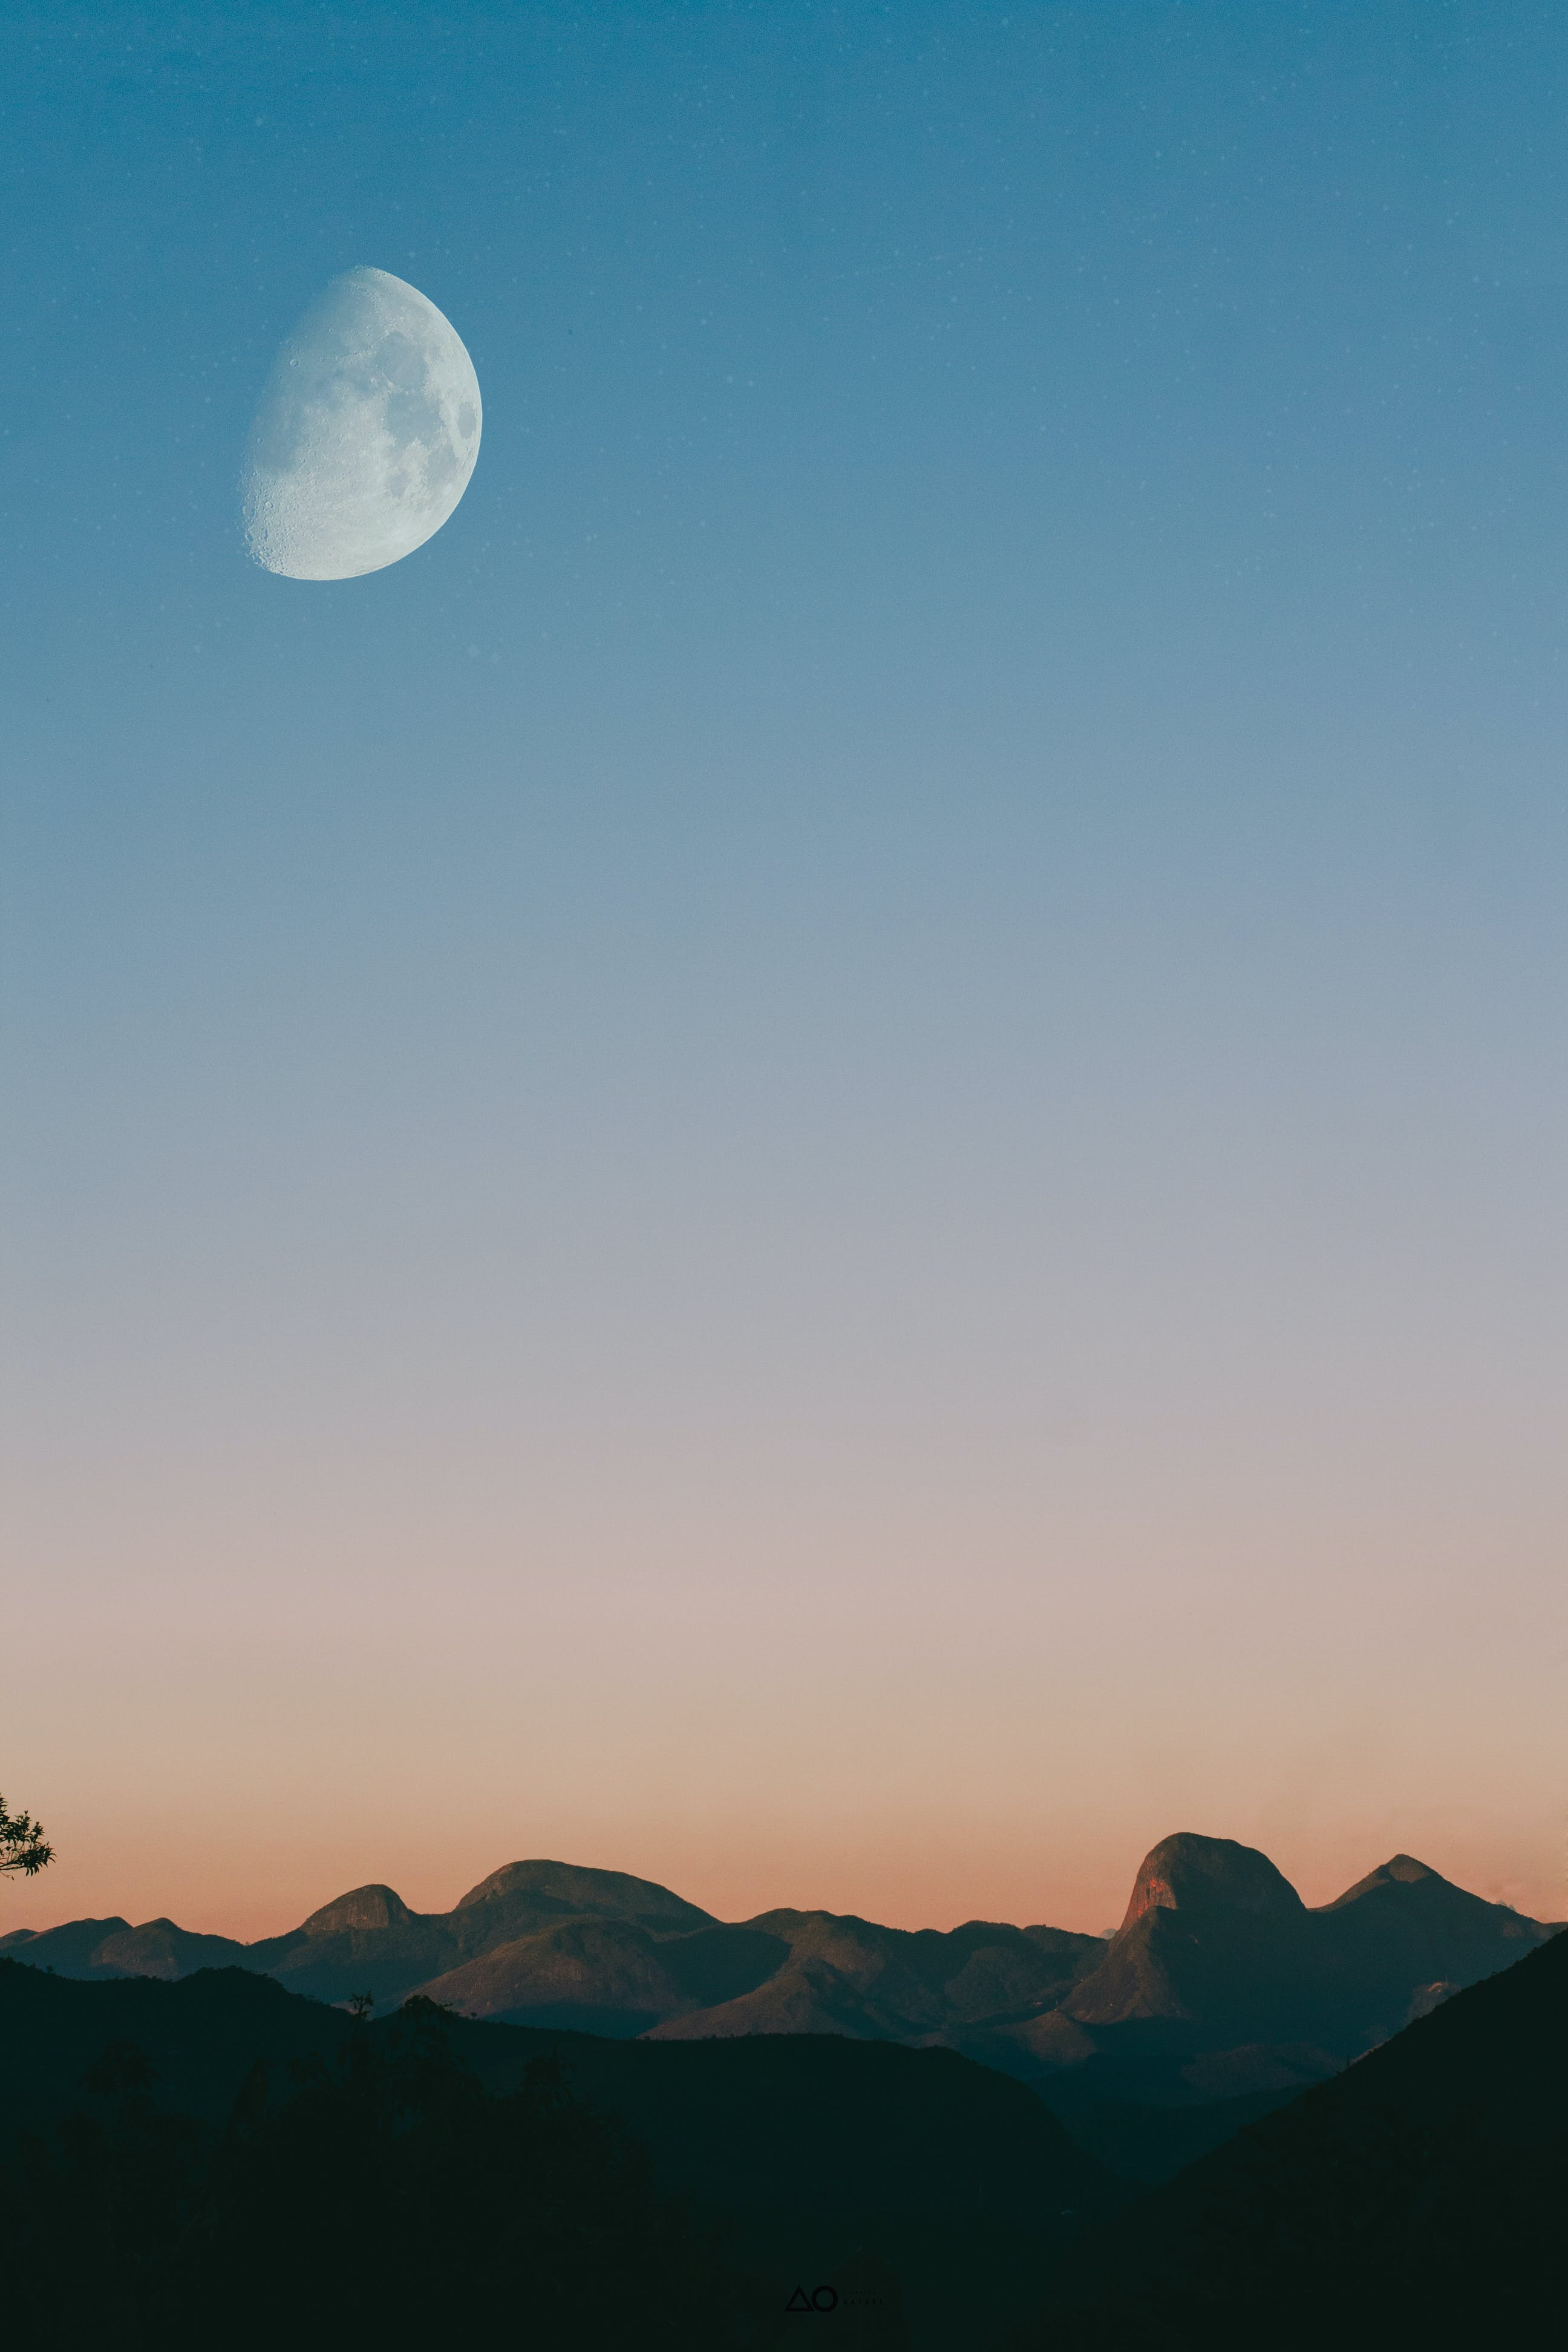 Moon Over Mountain Range